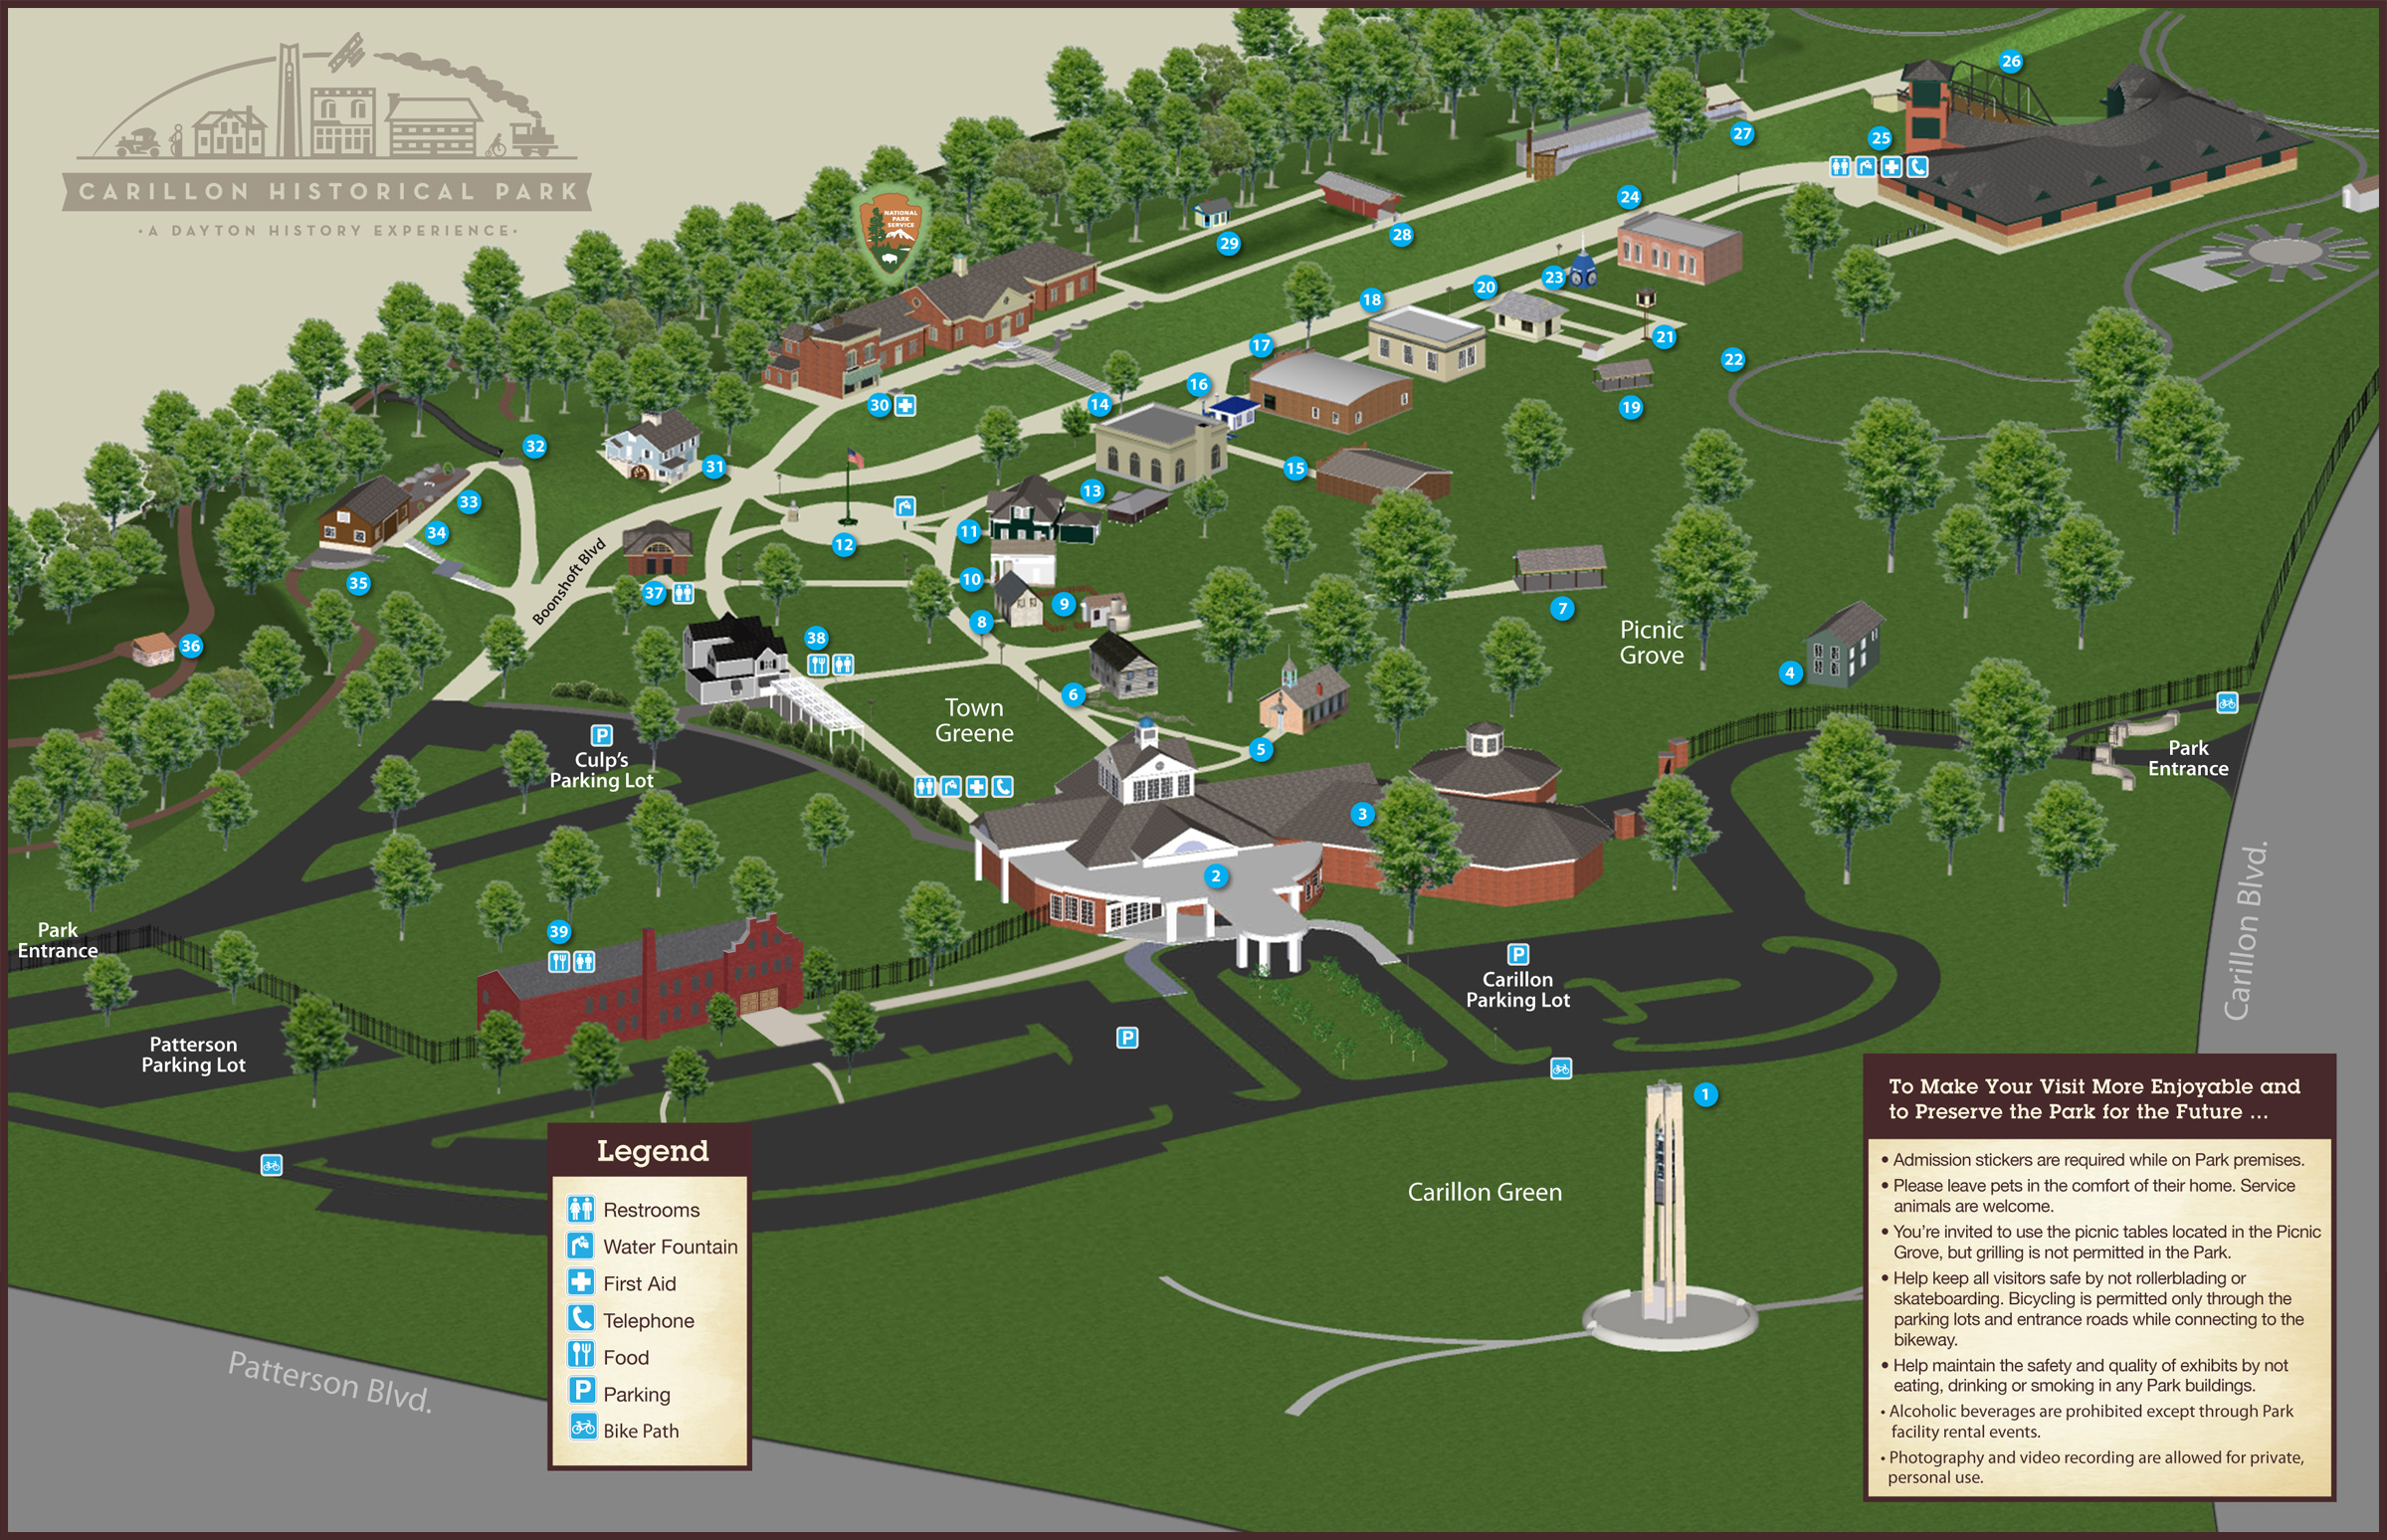 Park Map - Dayton History